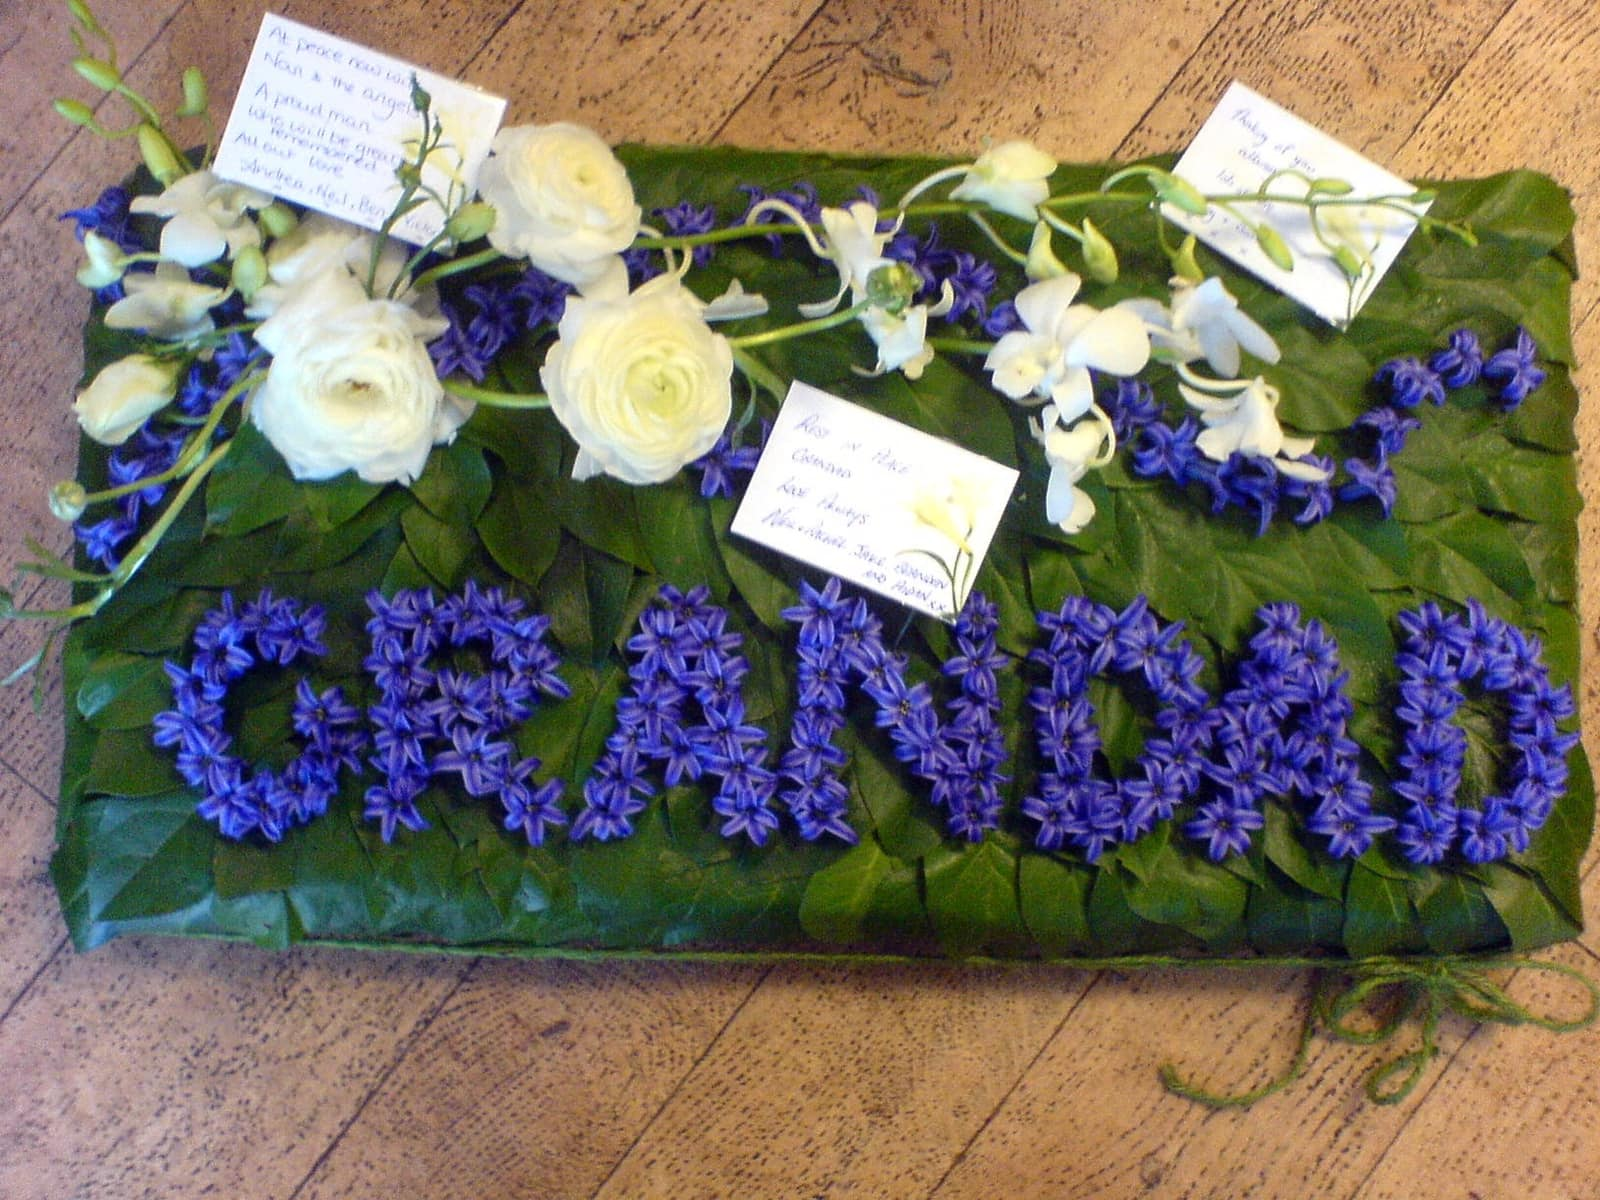 Funeral libby ferris flowers grandad design sheet with hyacinth e izmirmasajfo Gallery